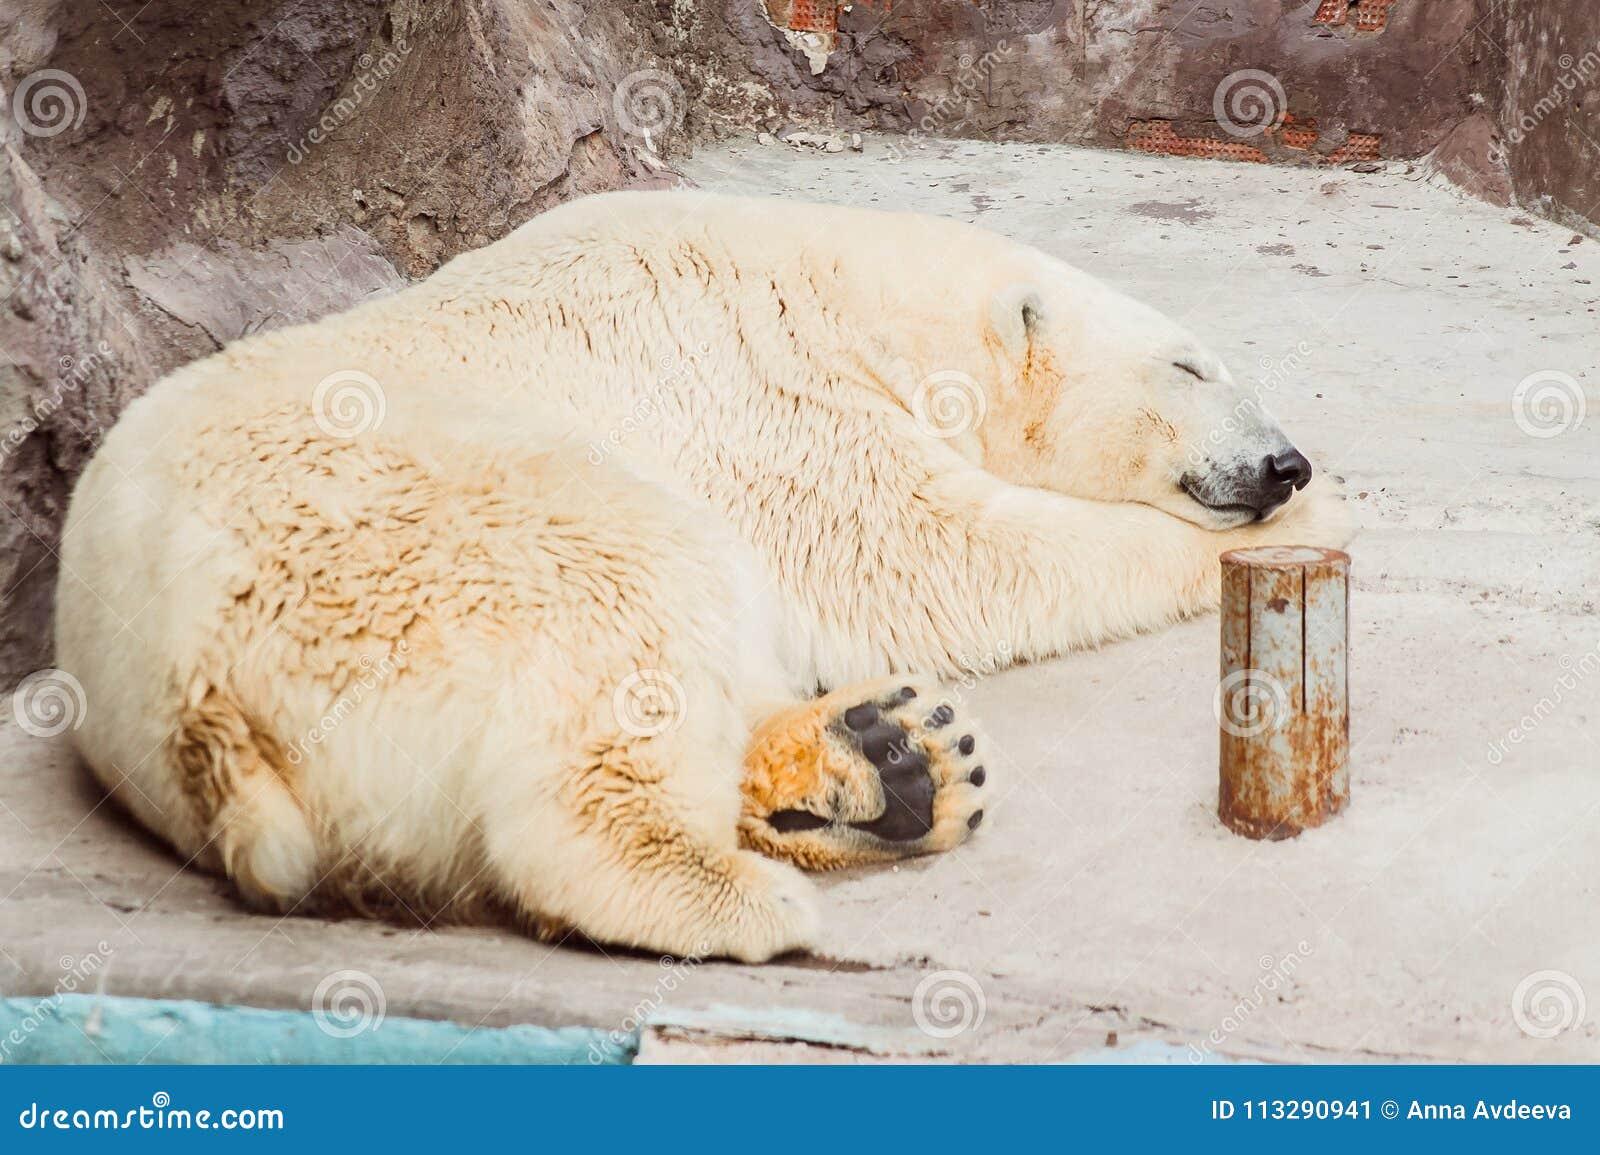 Sleeping polar bear in the zoo